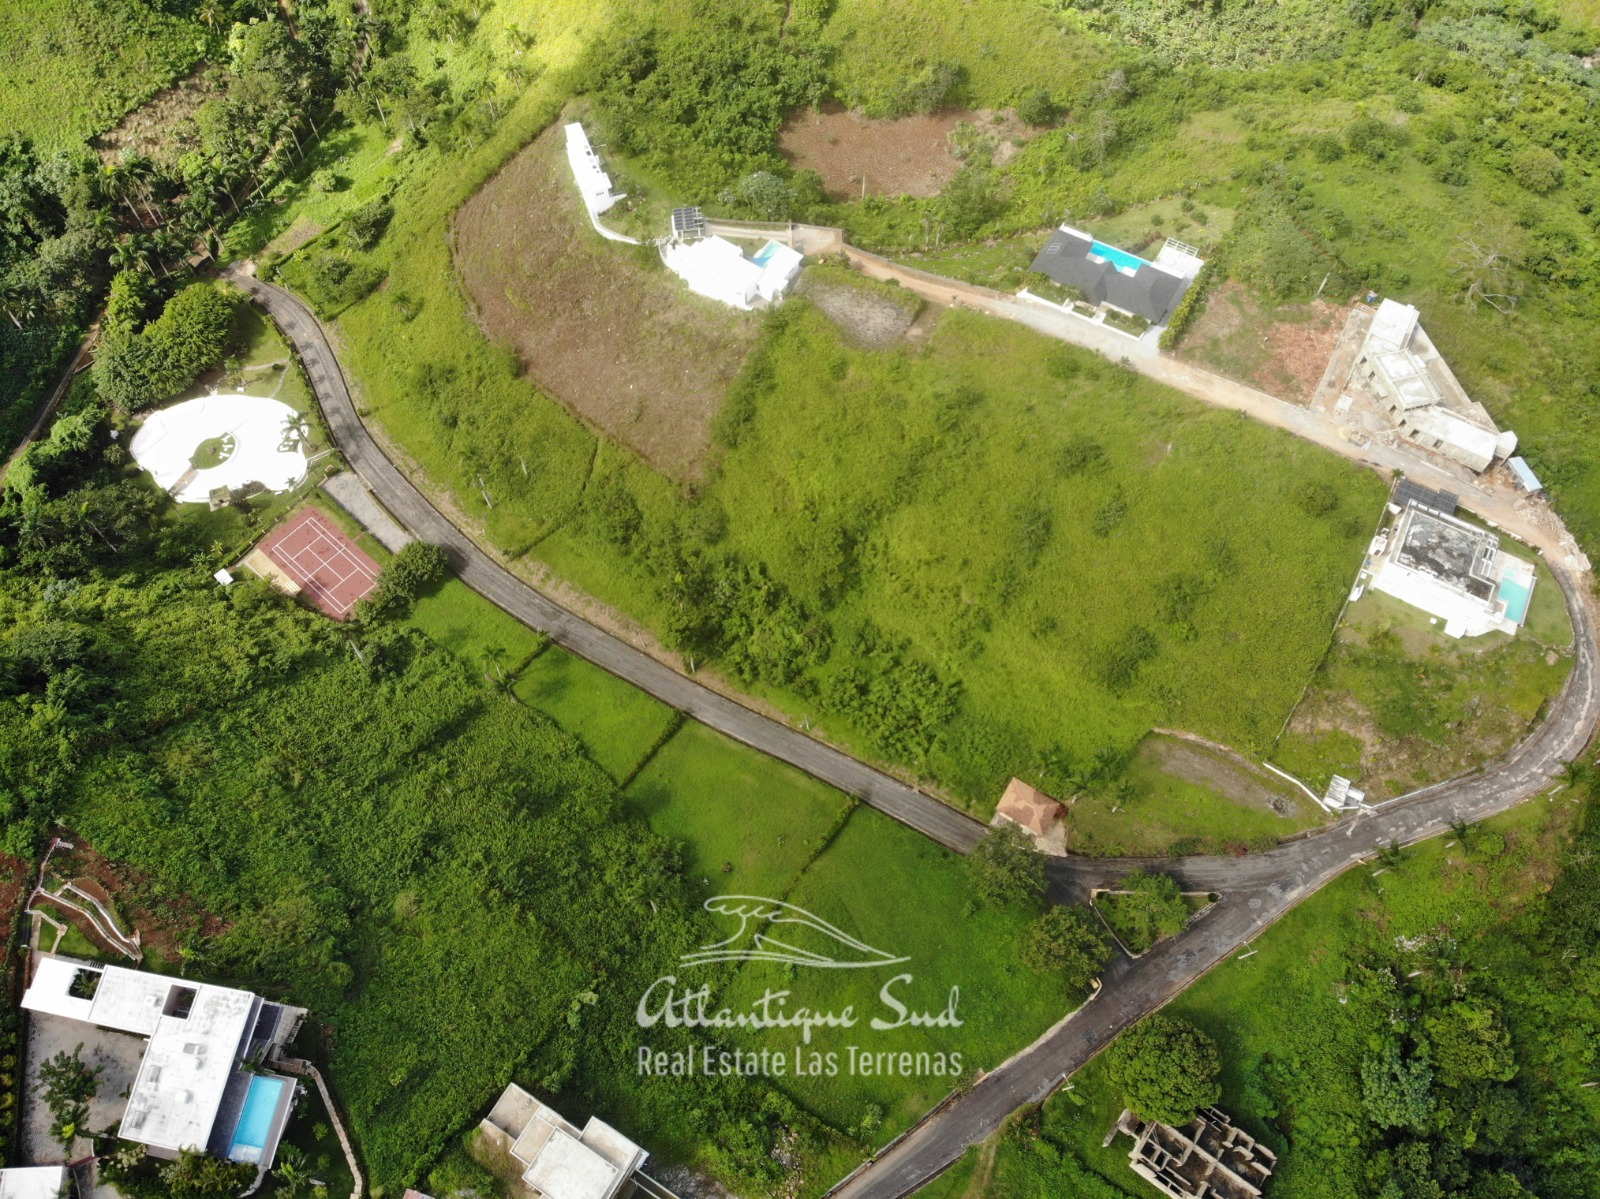 Hillside Lots for sale in Las Terrenas31.jpeg